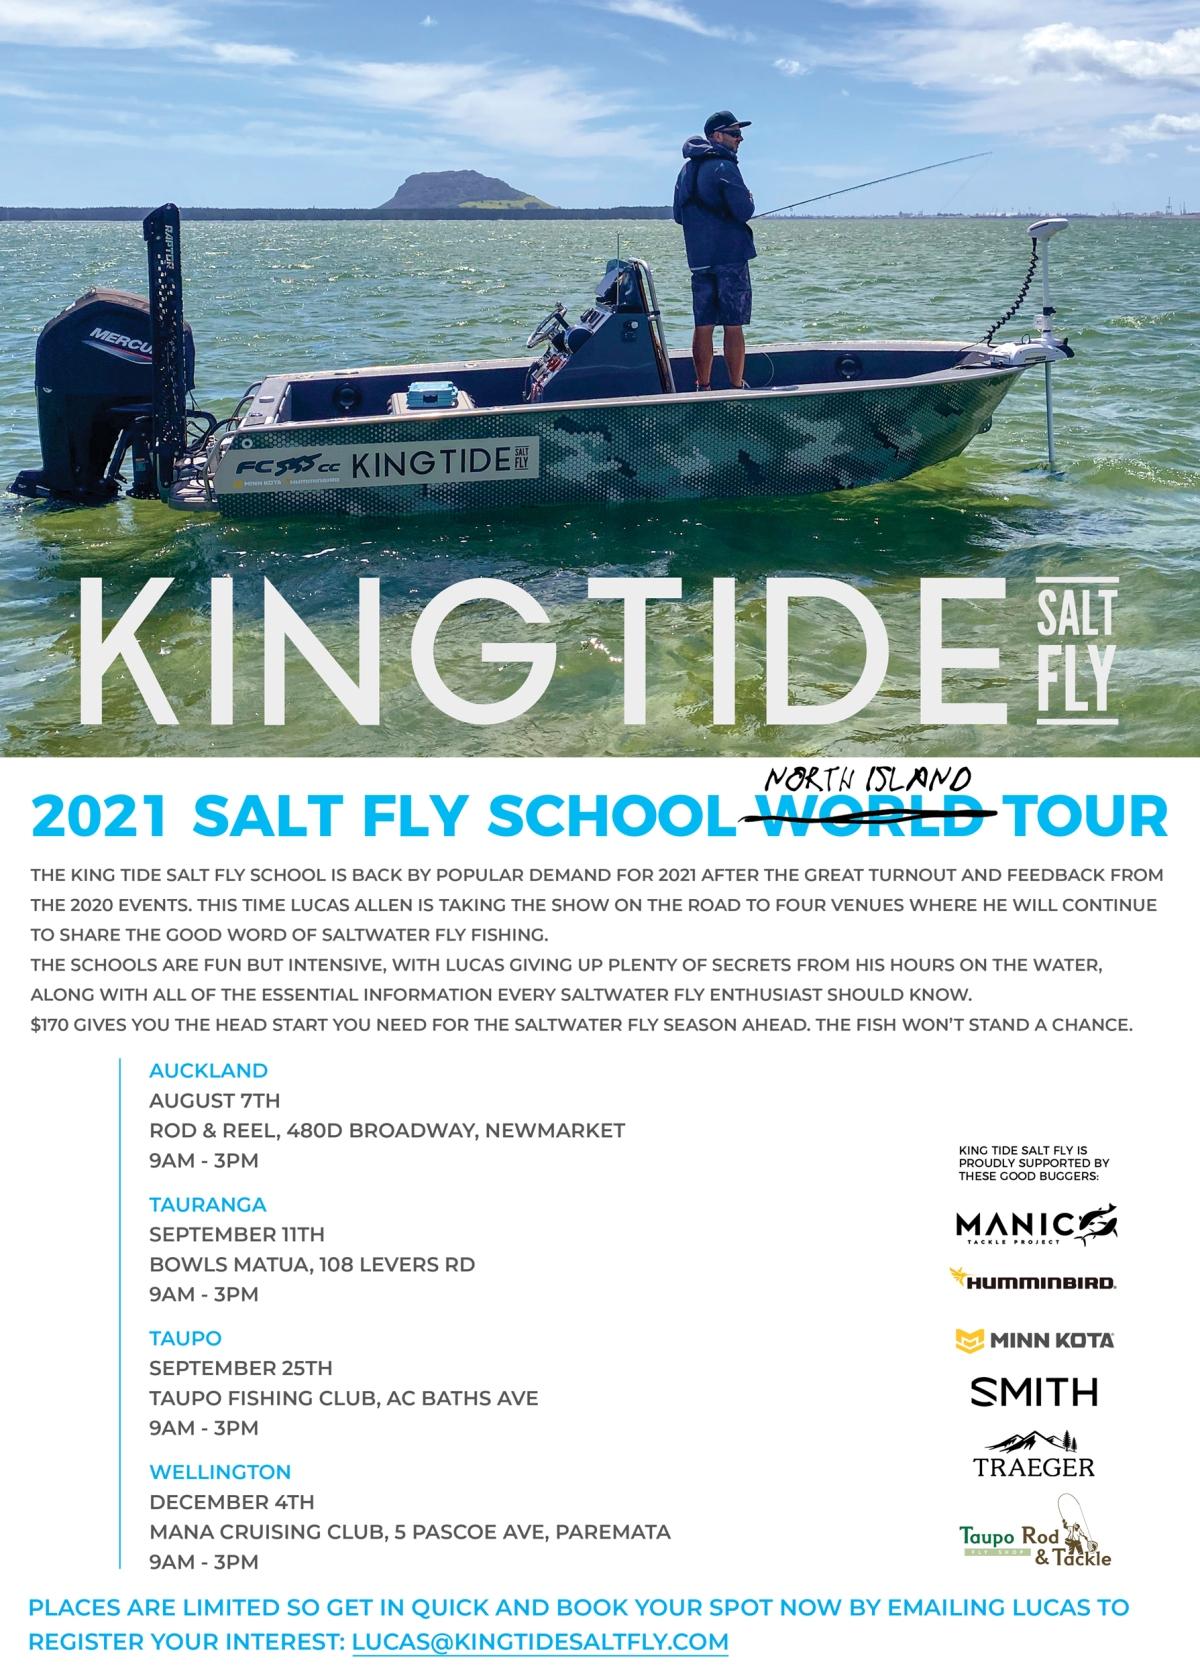 Salt Fly School North Island Tour2021